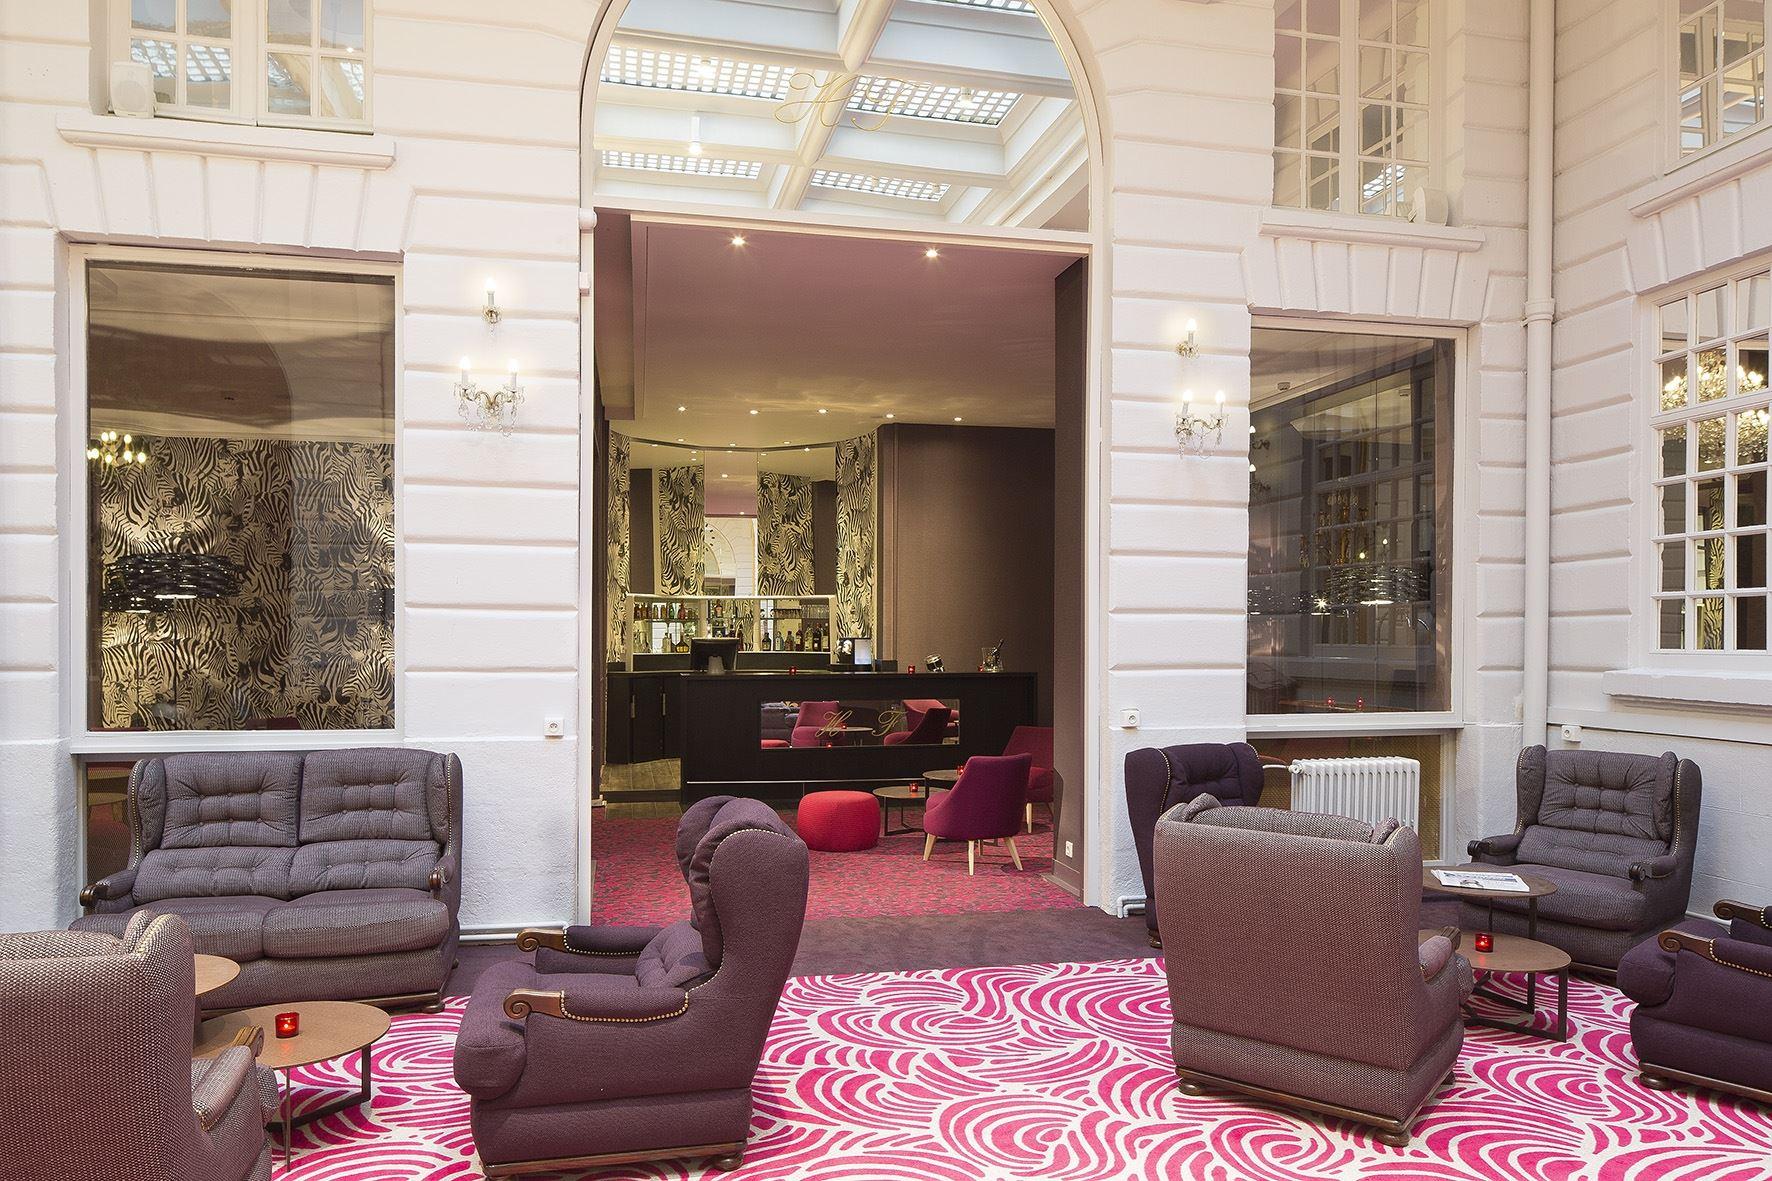 Hôtel Oceania Hôtel de France